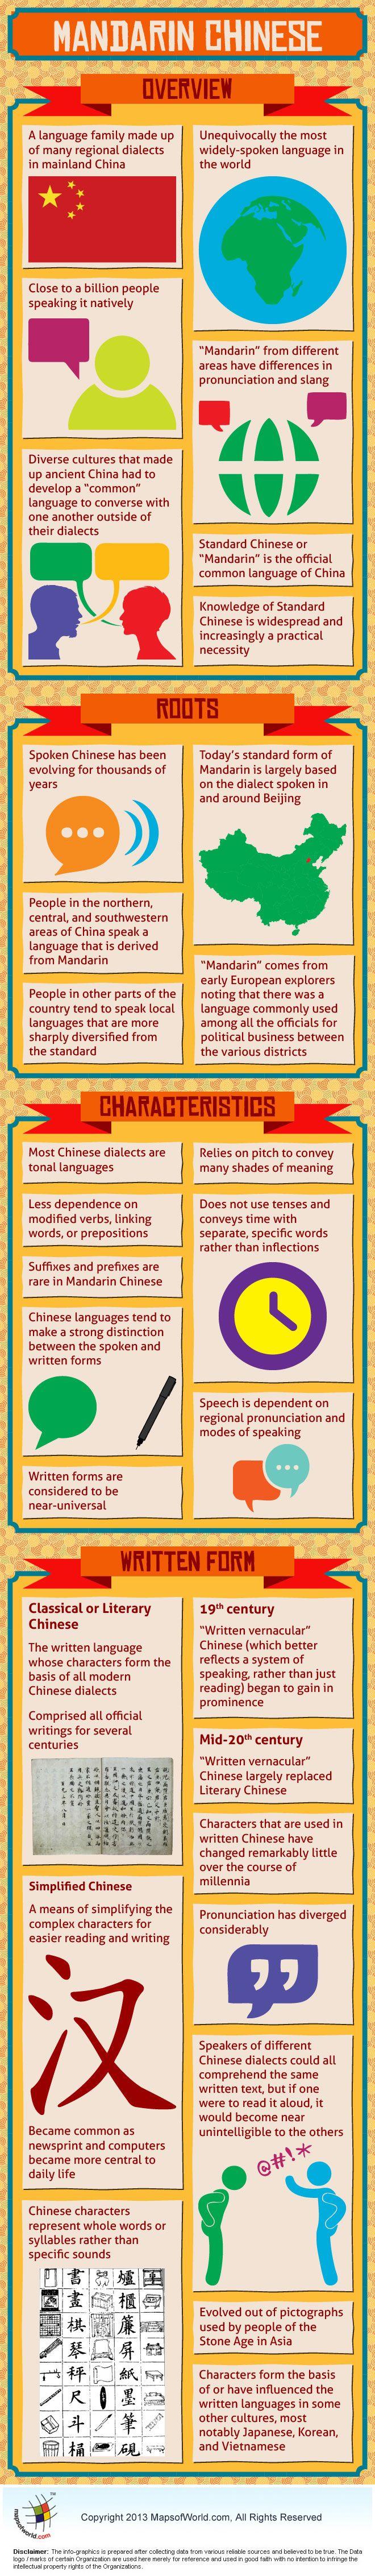 Mandarin Chinese - a quick overview  #Mandarin #Chinese #language